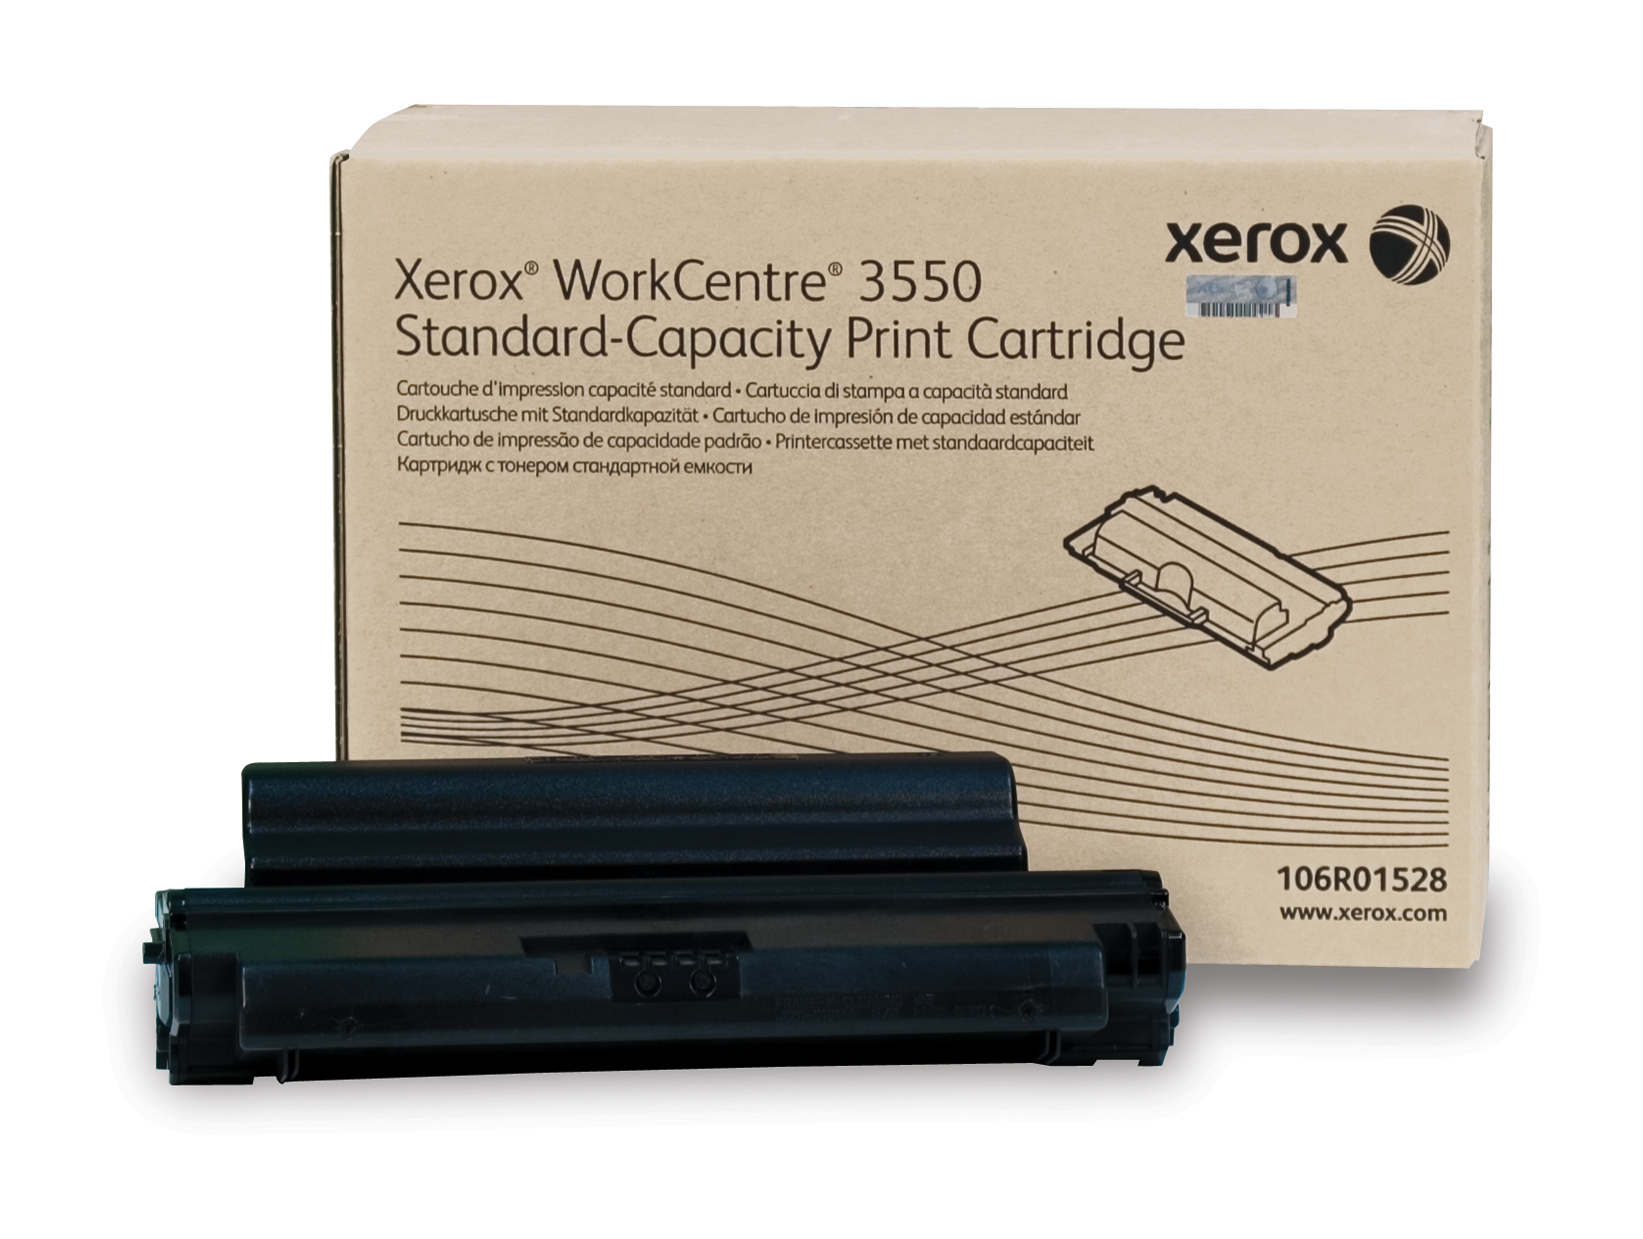 106R01528 | Original Xerox Toner Cartridge - Black